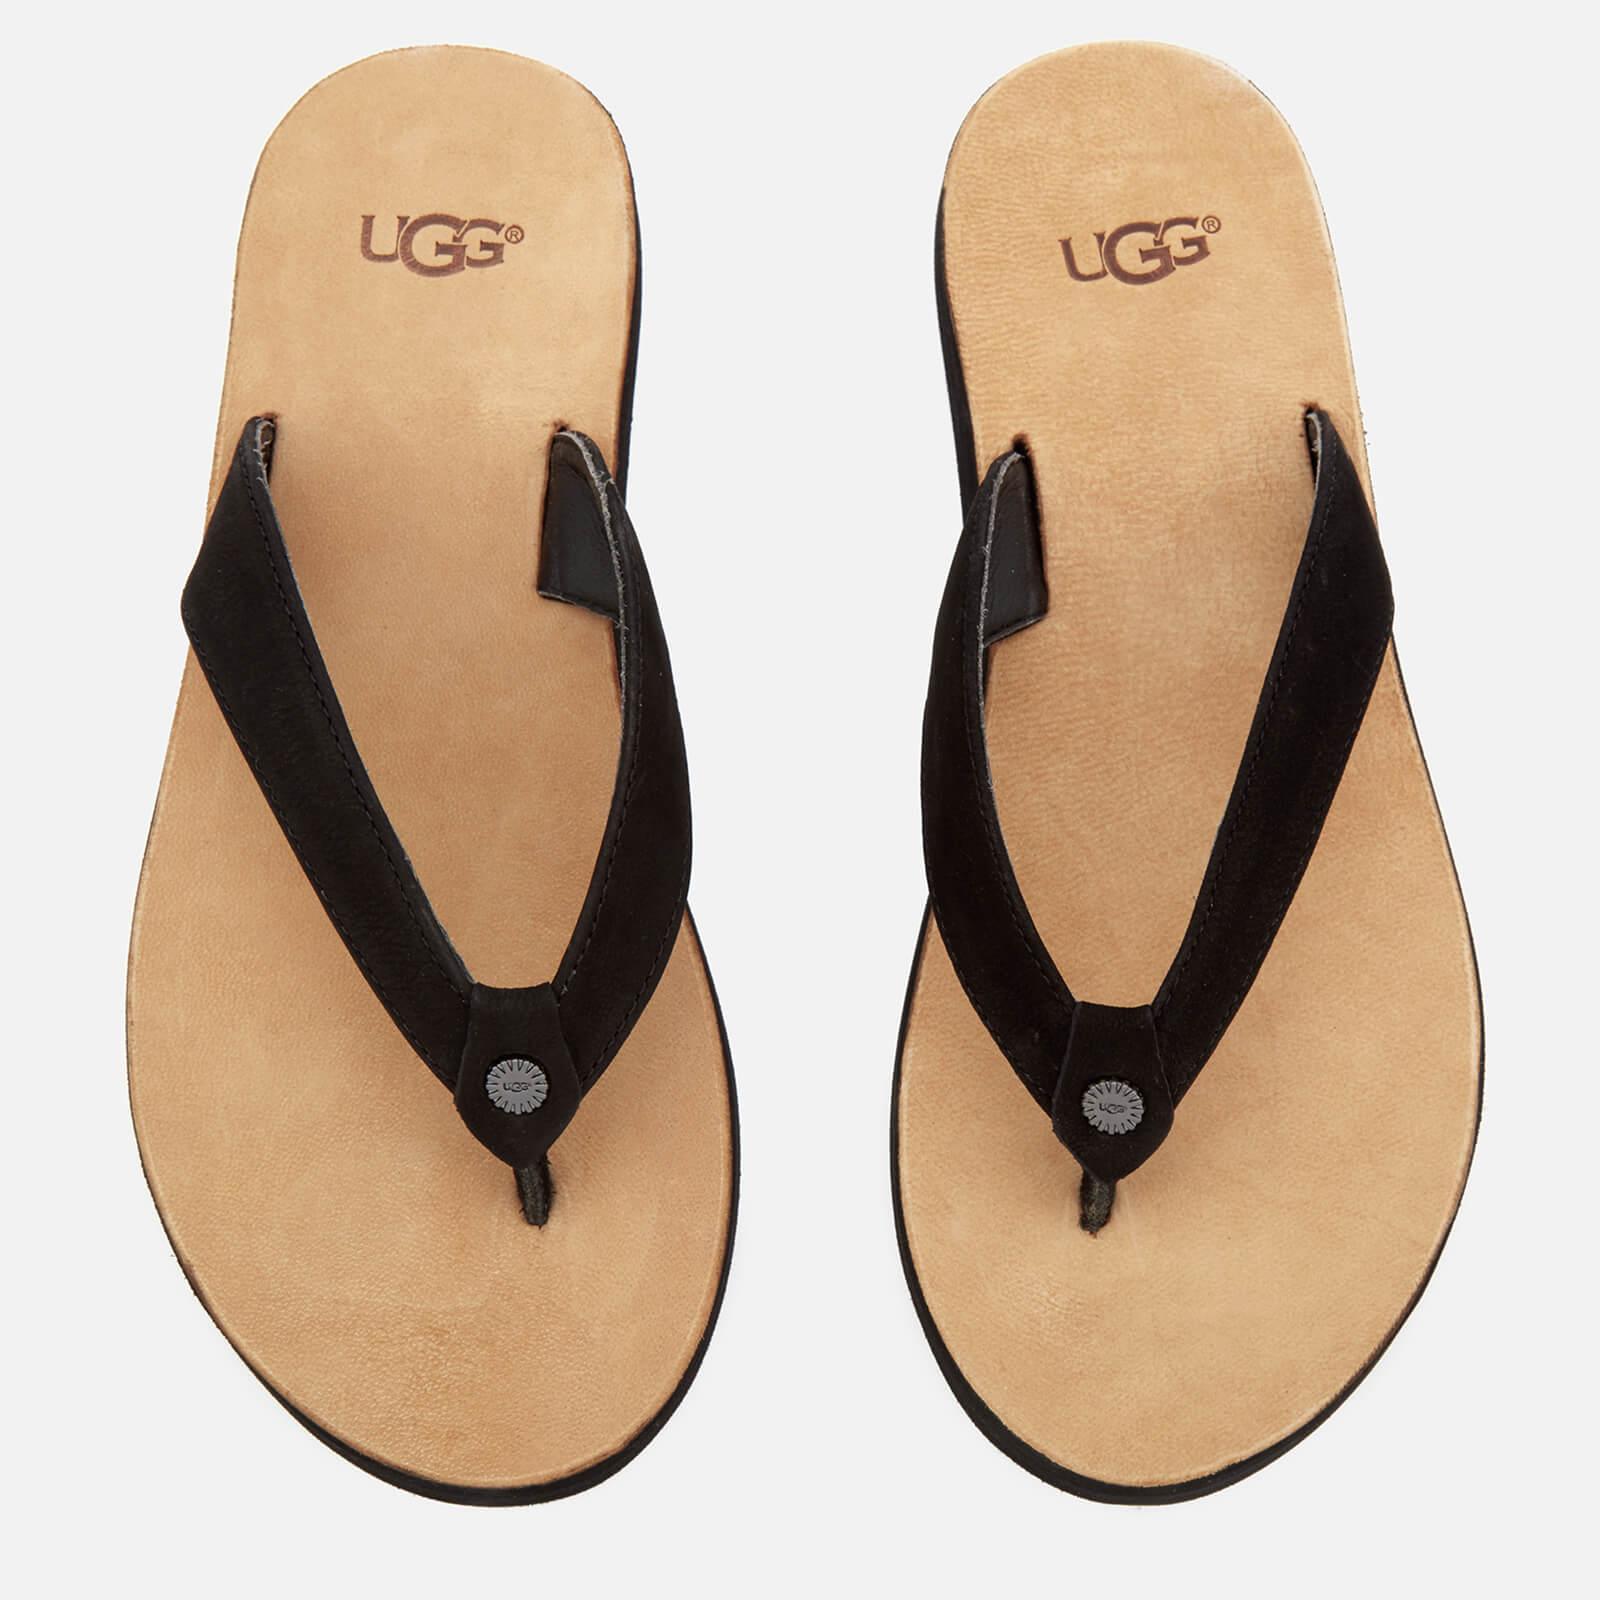 b7682e278a10 UGG Women s Tawney Flip Flops - Black